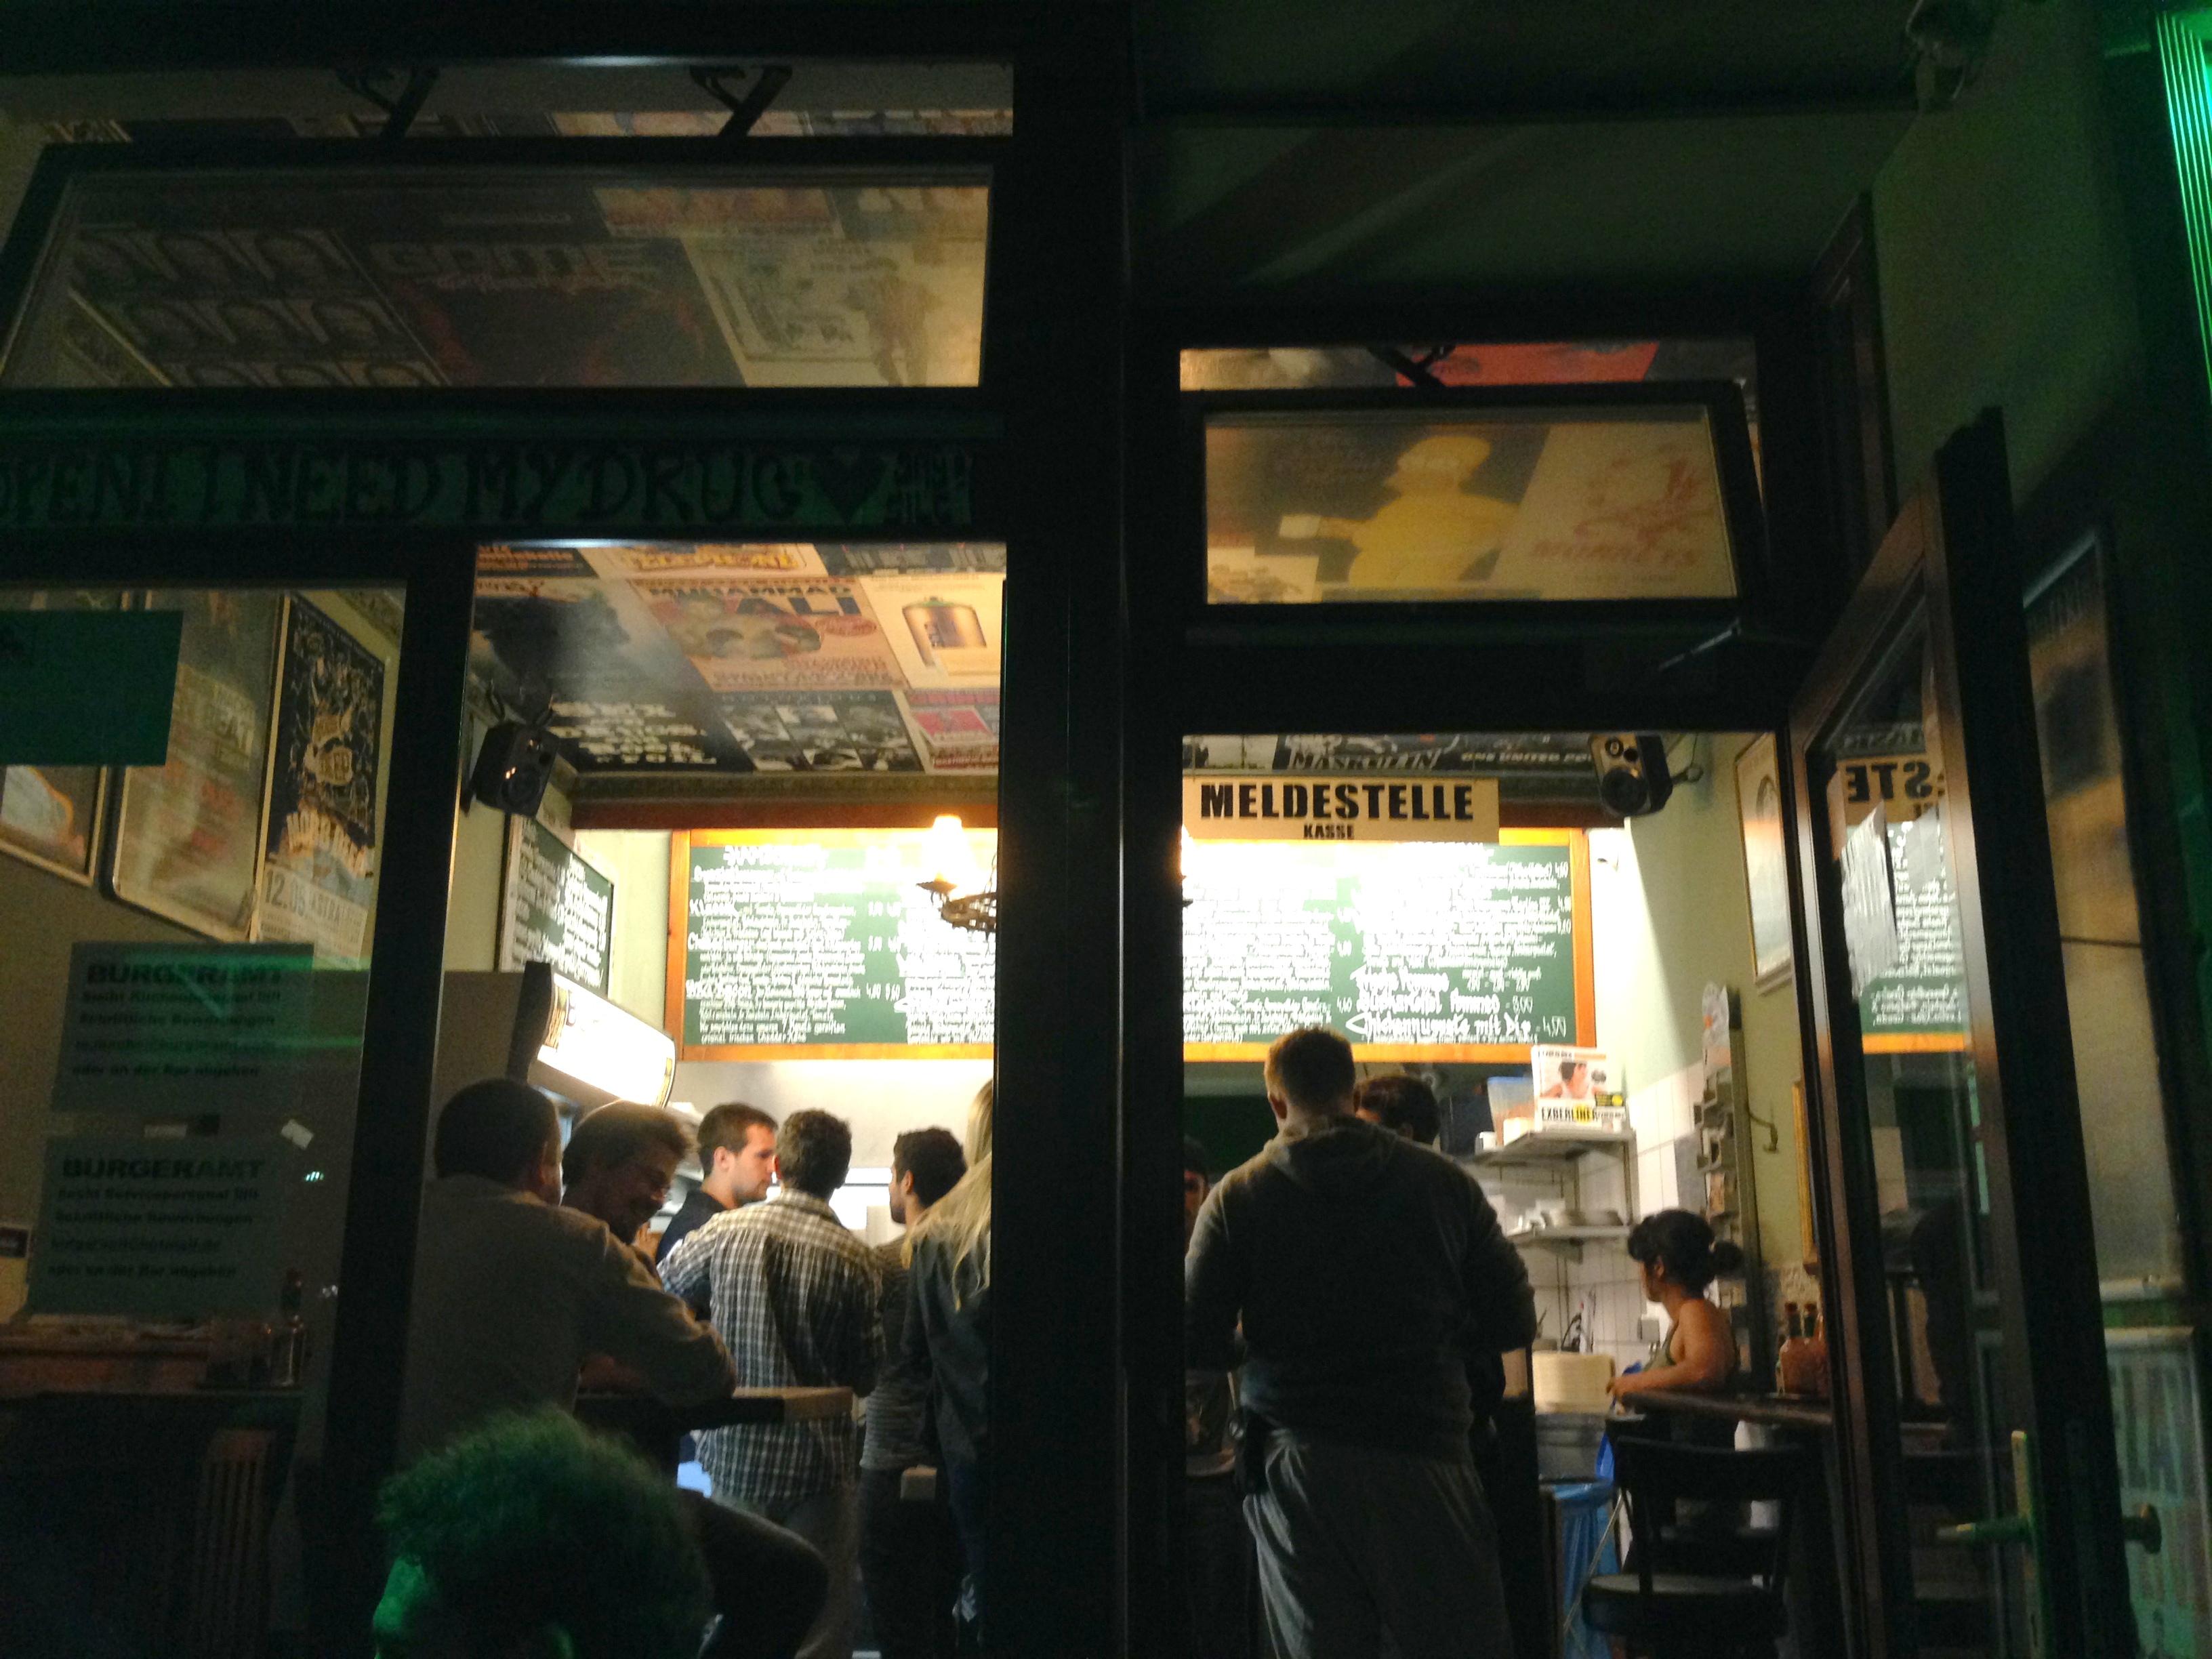 burgeramt-burgerimbiss-berlin-friedrichshain | berlin ick liebe dir